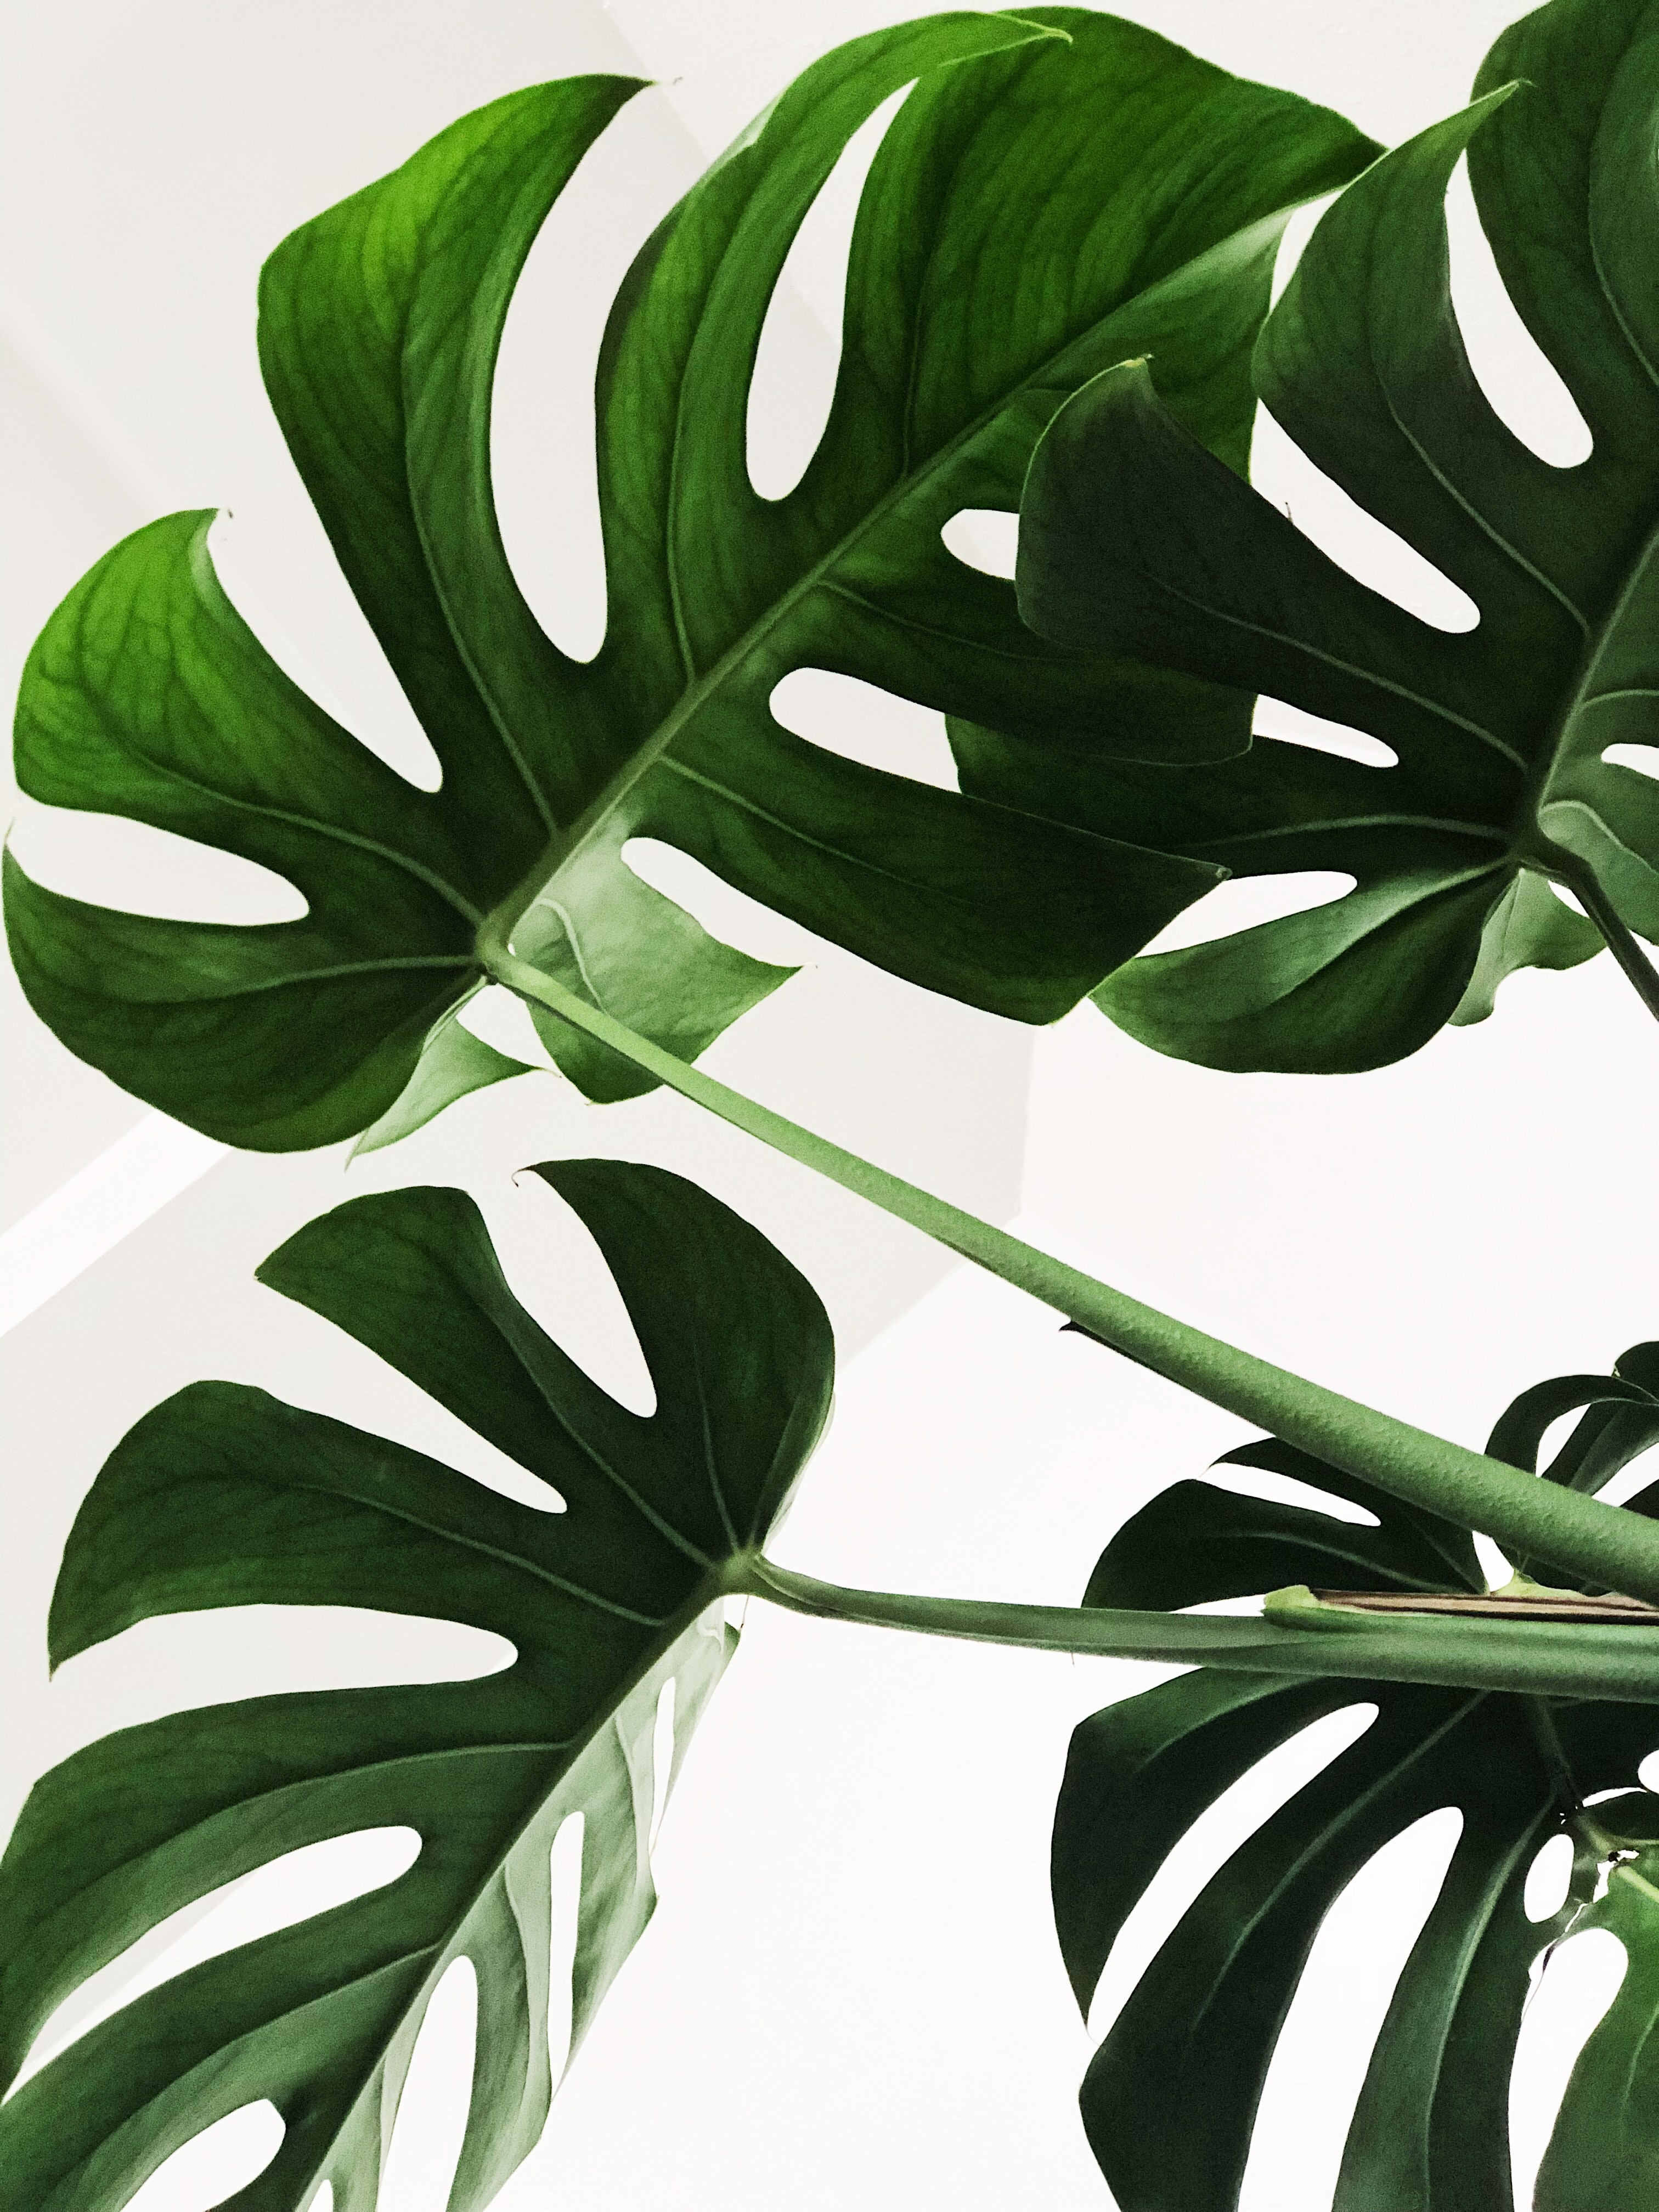 Grønn plante